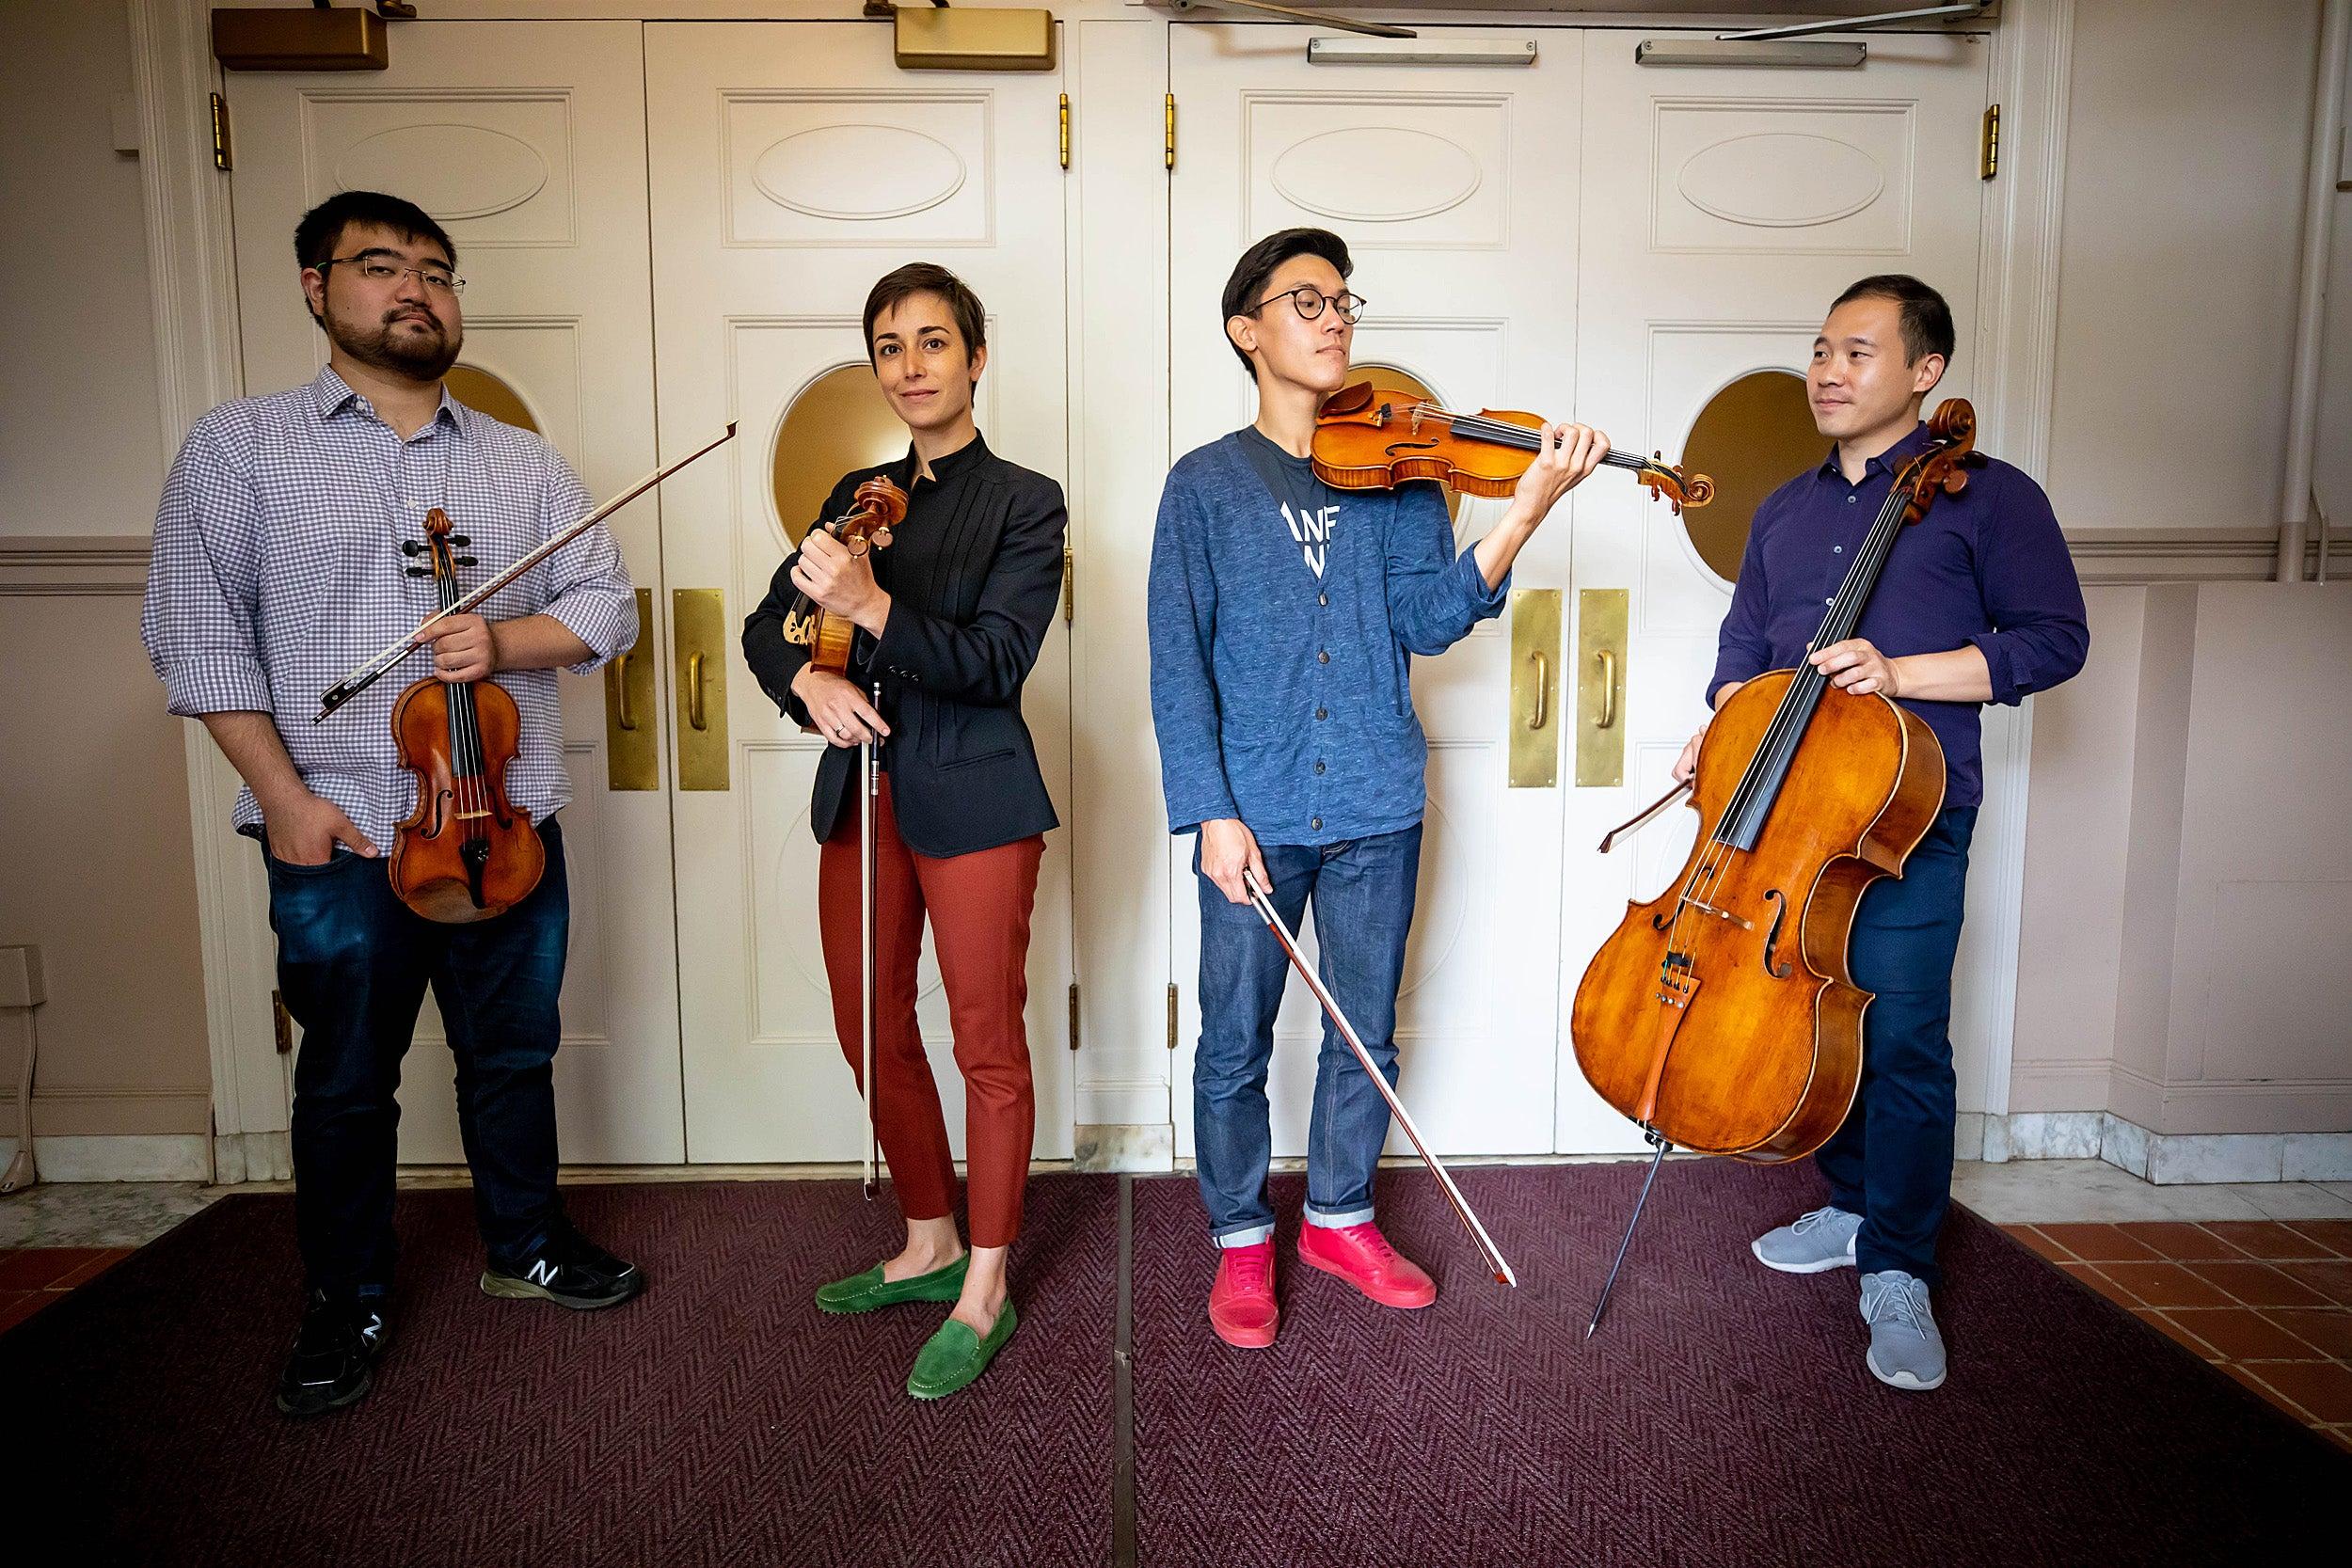 As artists in residence, Parker Quartet make Harvard their home